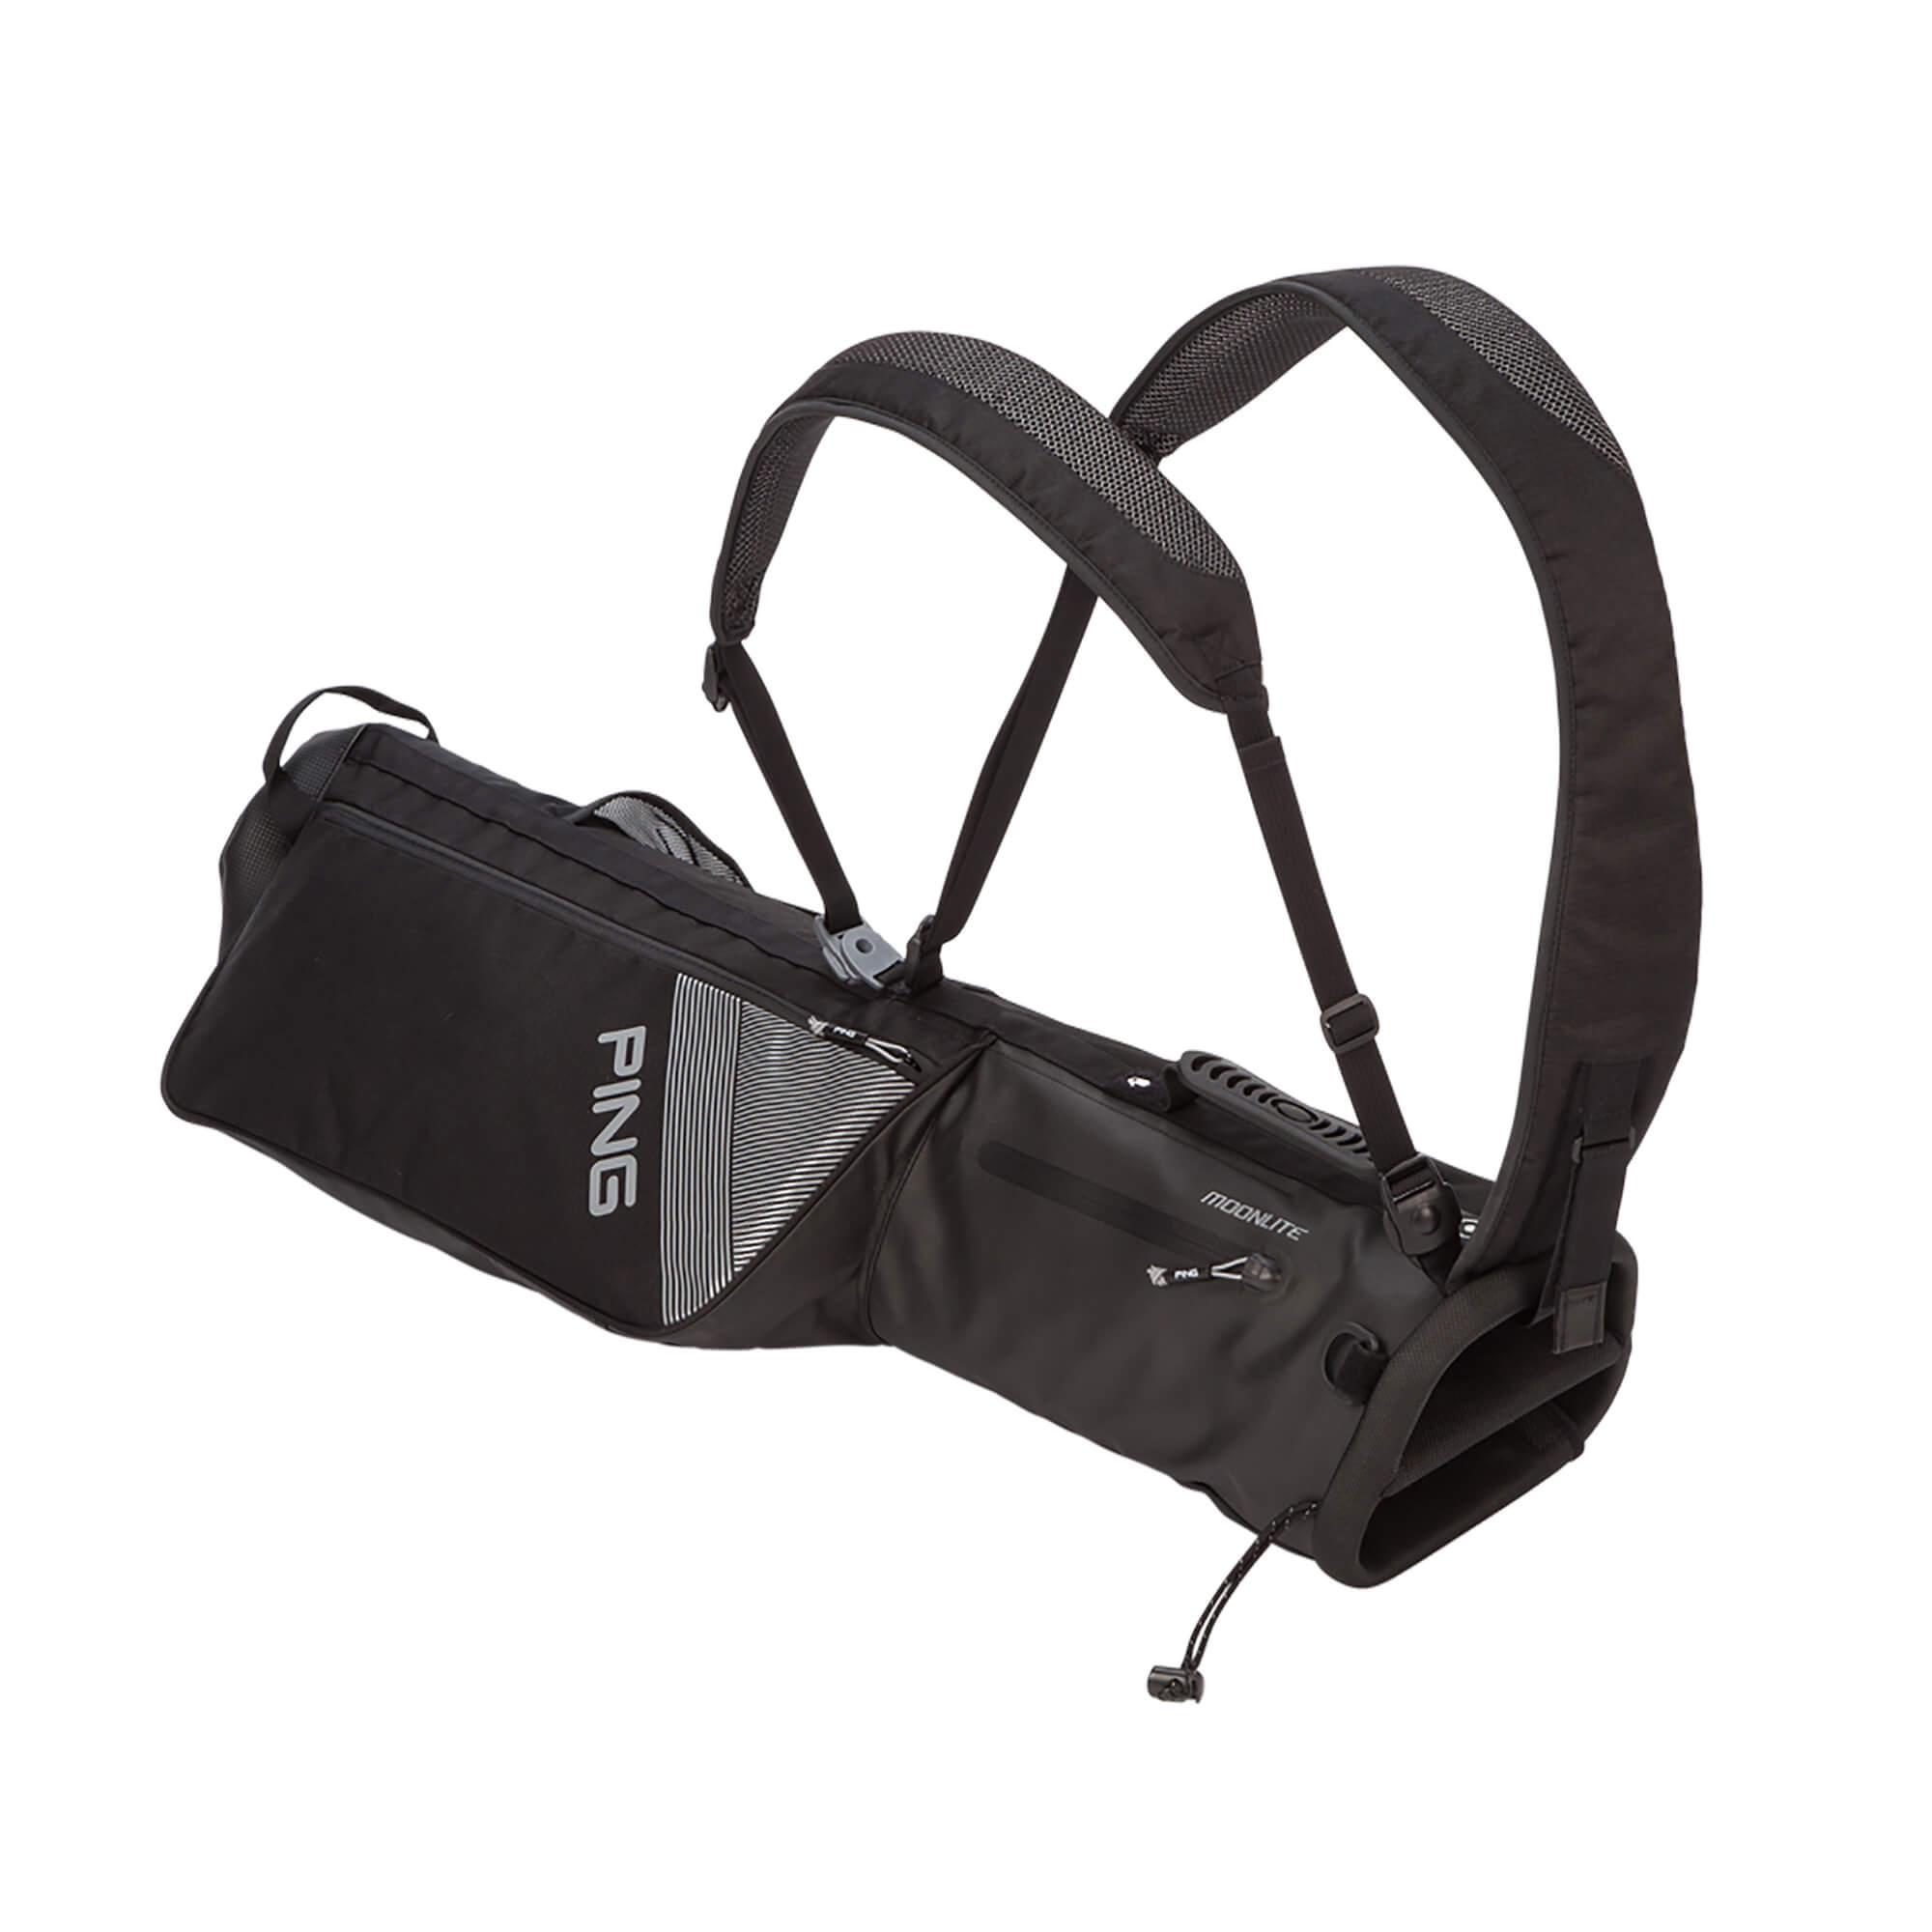 Ping 2015 Moonlite Bag by Ping Golf - Golf Carry Bags  |Ping Moonlight Golf Bag